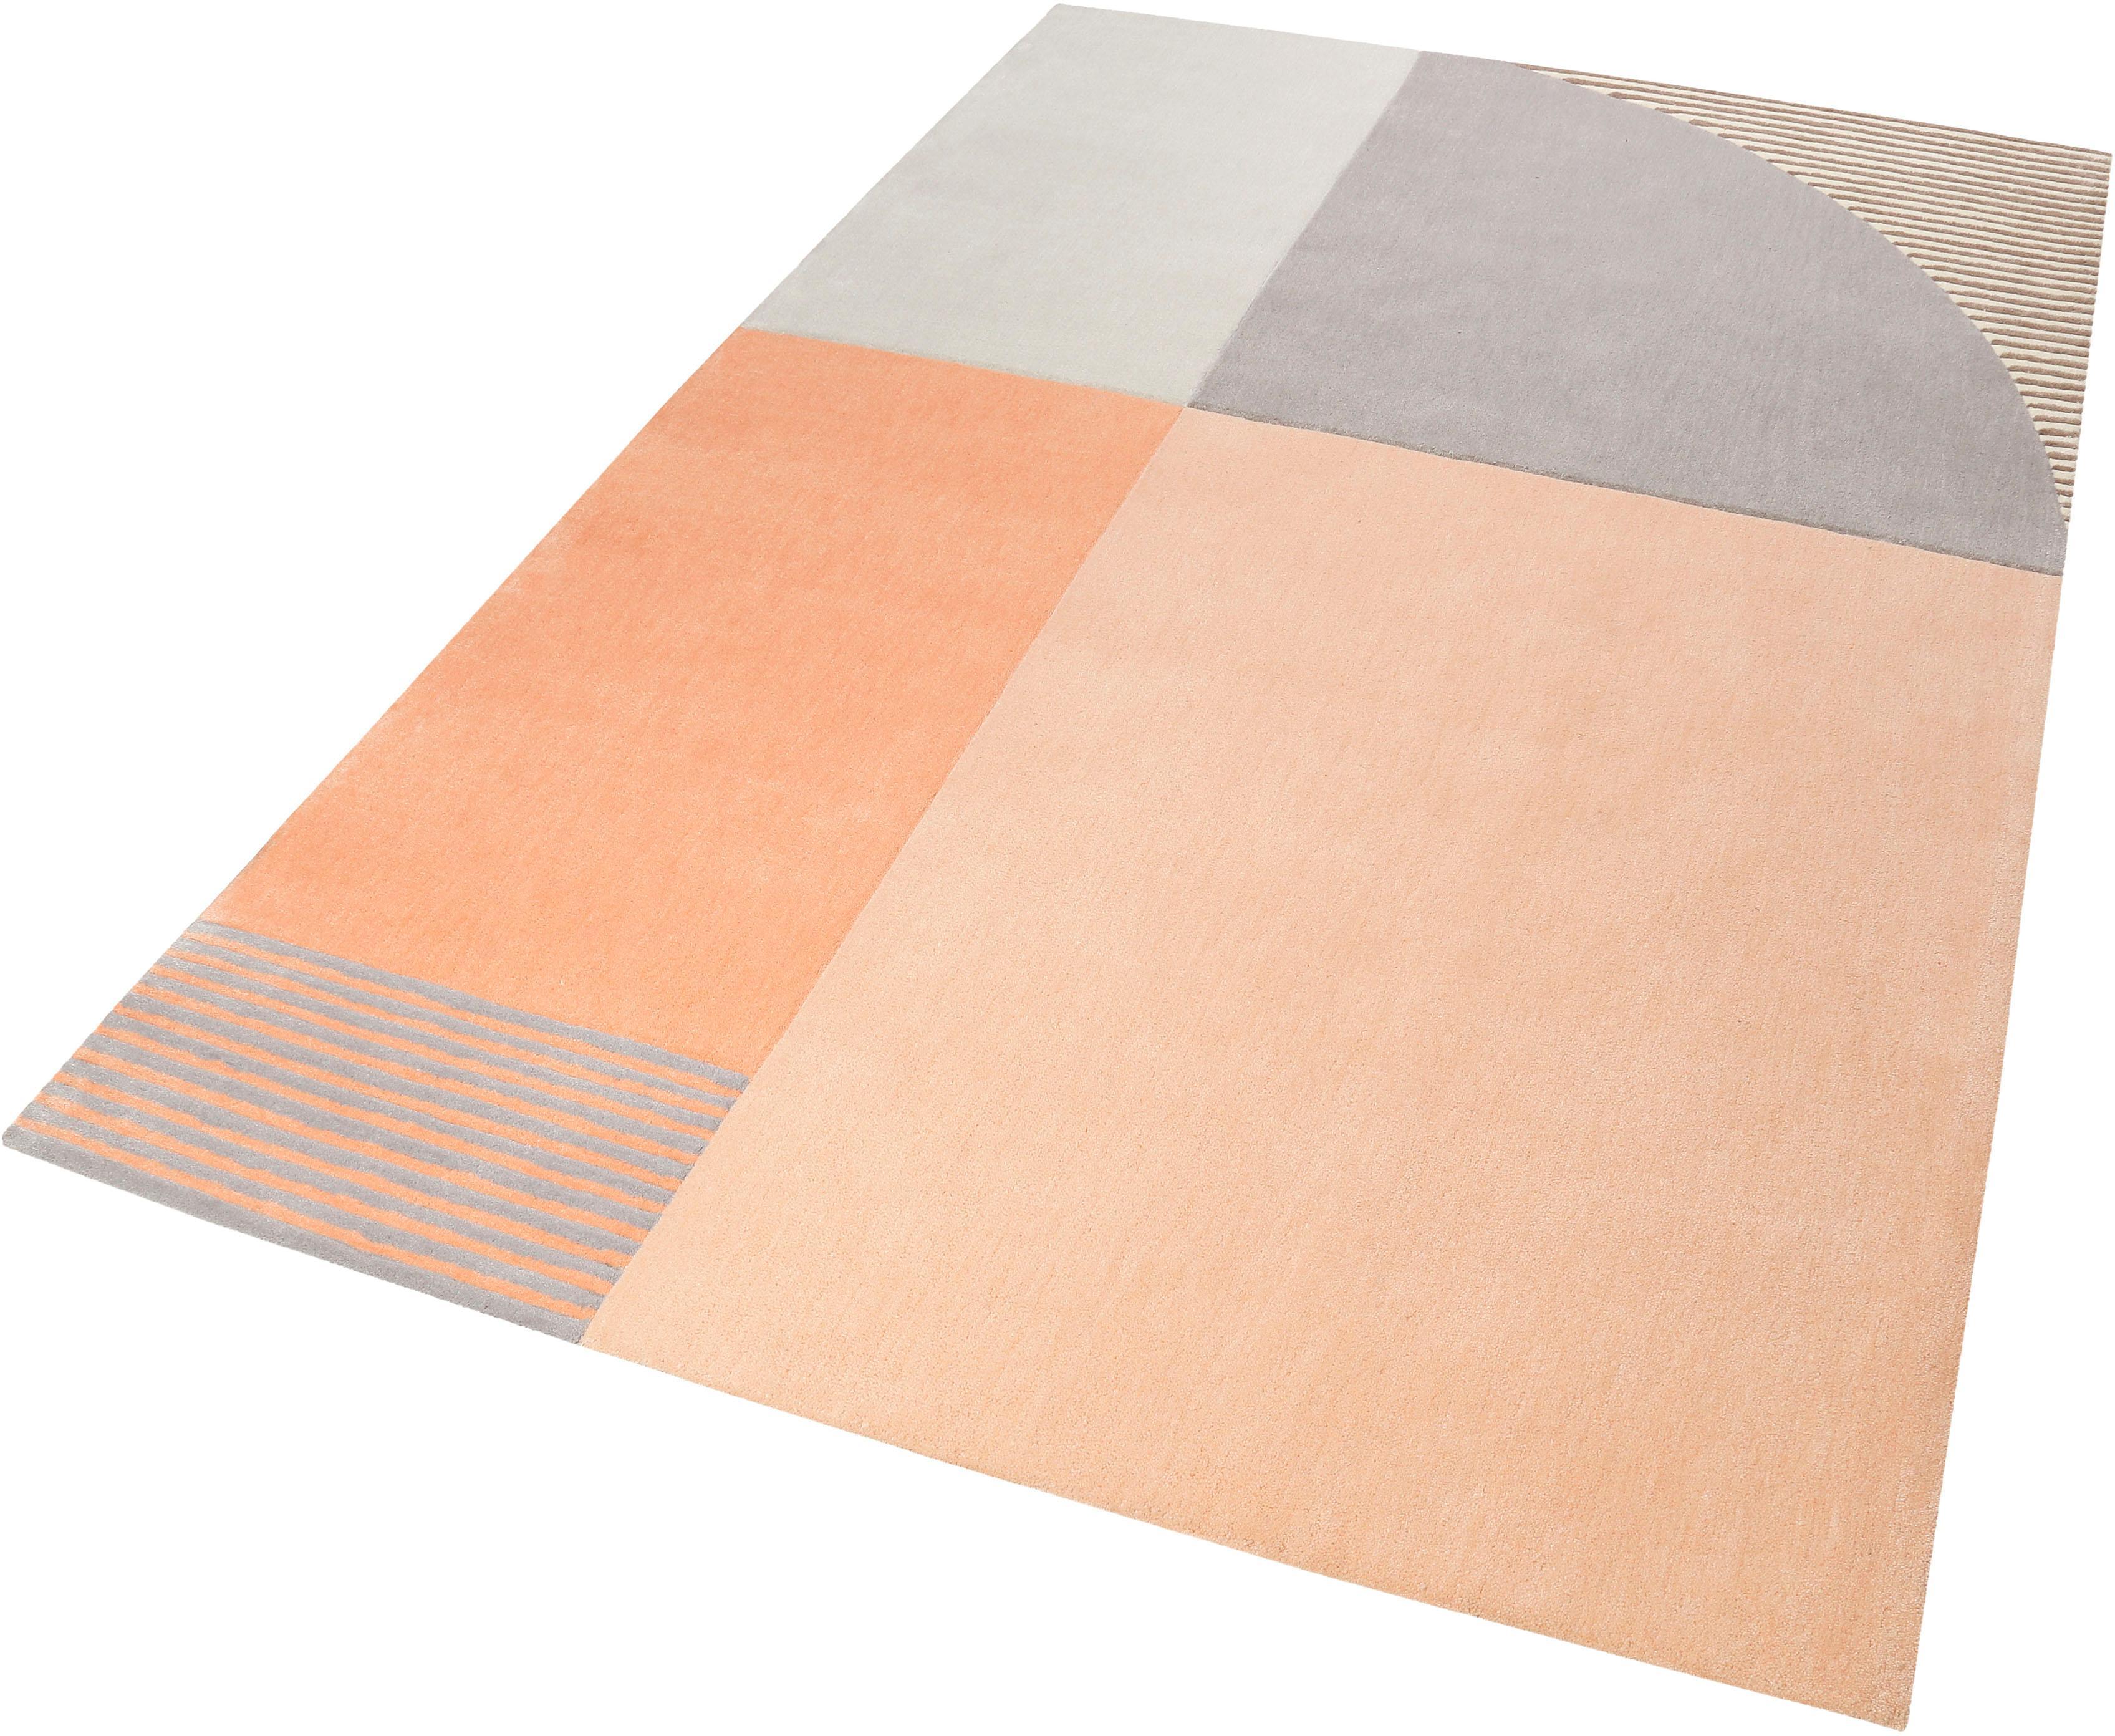 Teppich Runway Esprit rechteckig Höhe 9 mm maschinell getuftet